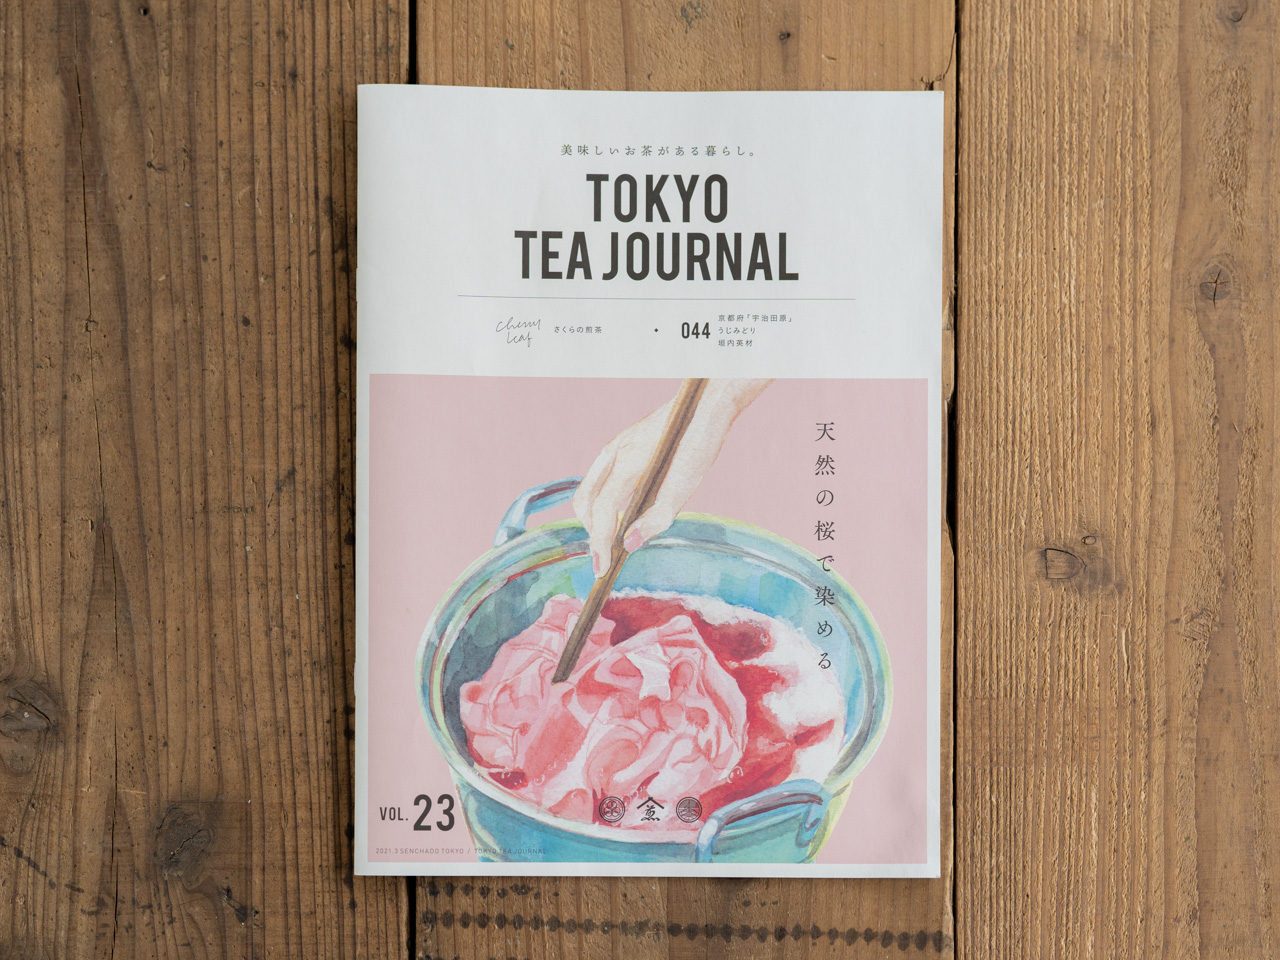 TOKYO TEA JOURNAL VOL.23